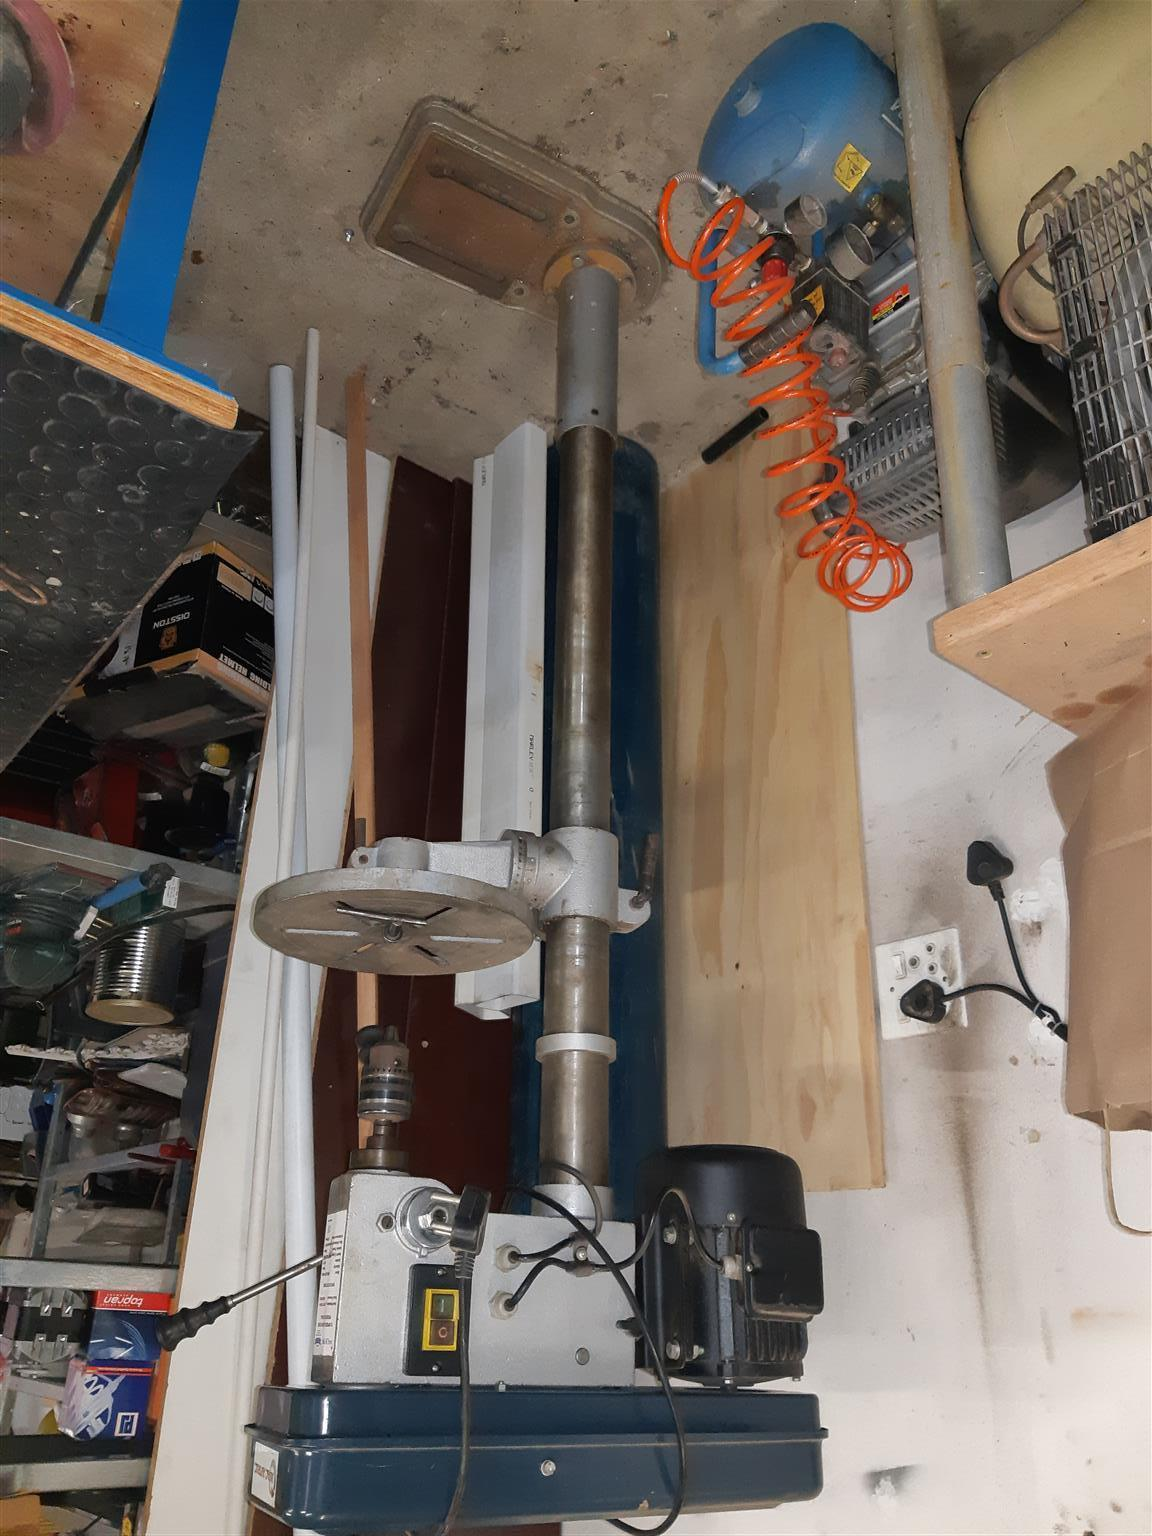 Pedestal drill floor standing. Excellent condition.